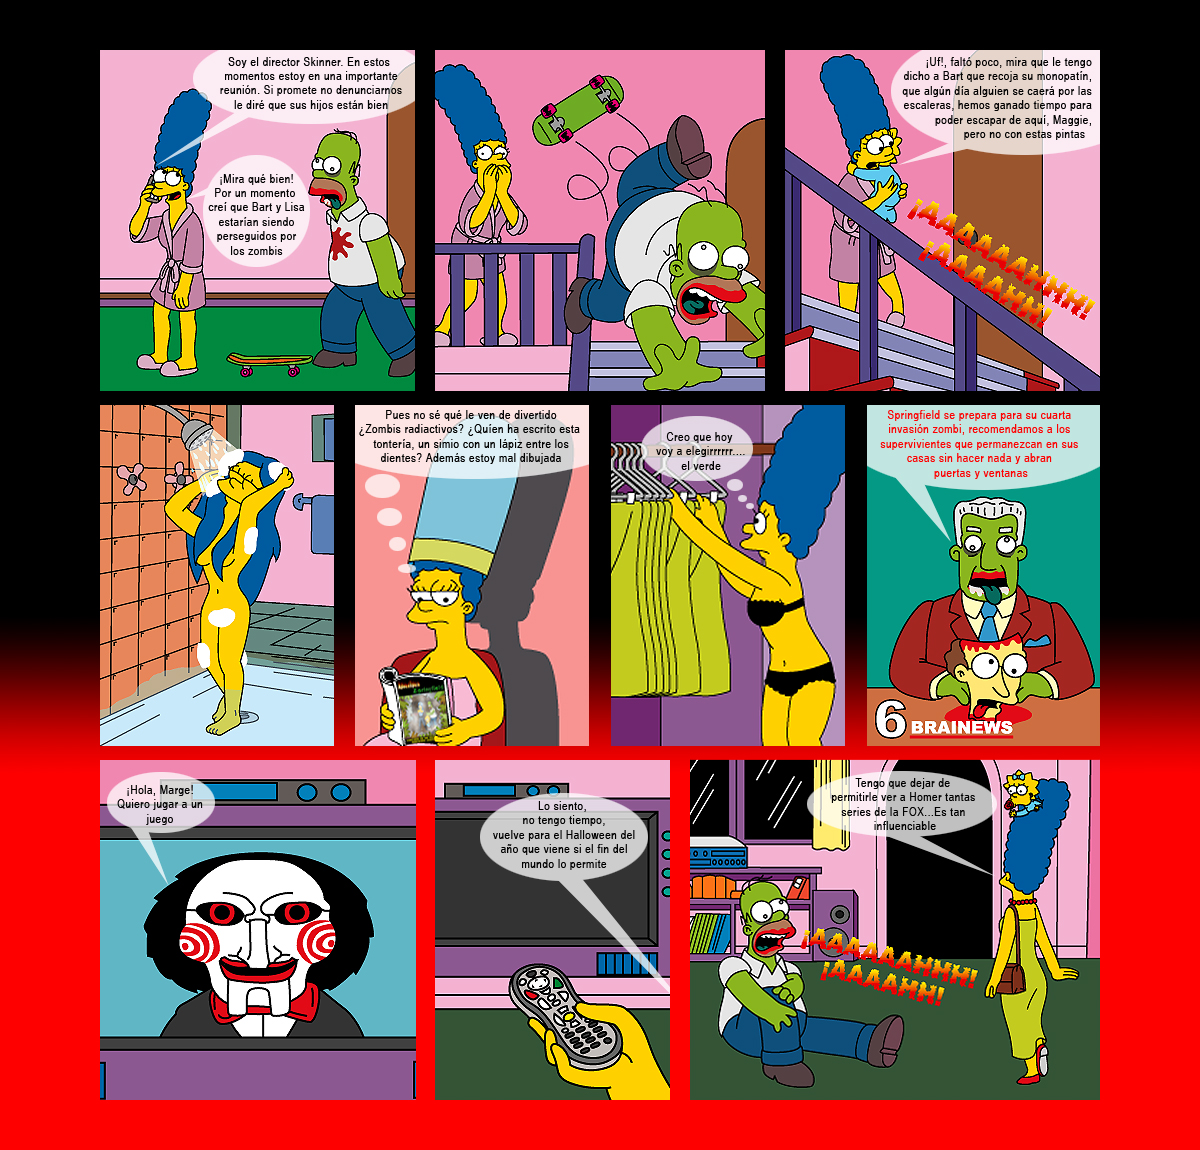 Marge Simpson desnuda | Apocalipsis Zpringfield | Página 2: https://zimpsons.wordpress.com/tag/marge-simpson-desnuda/page/2/